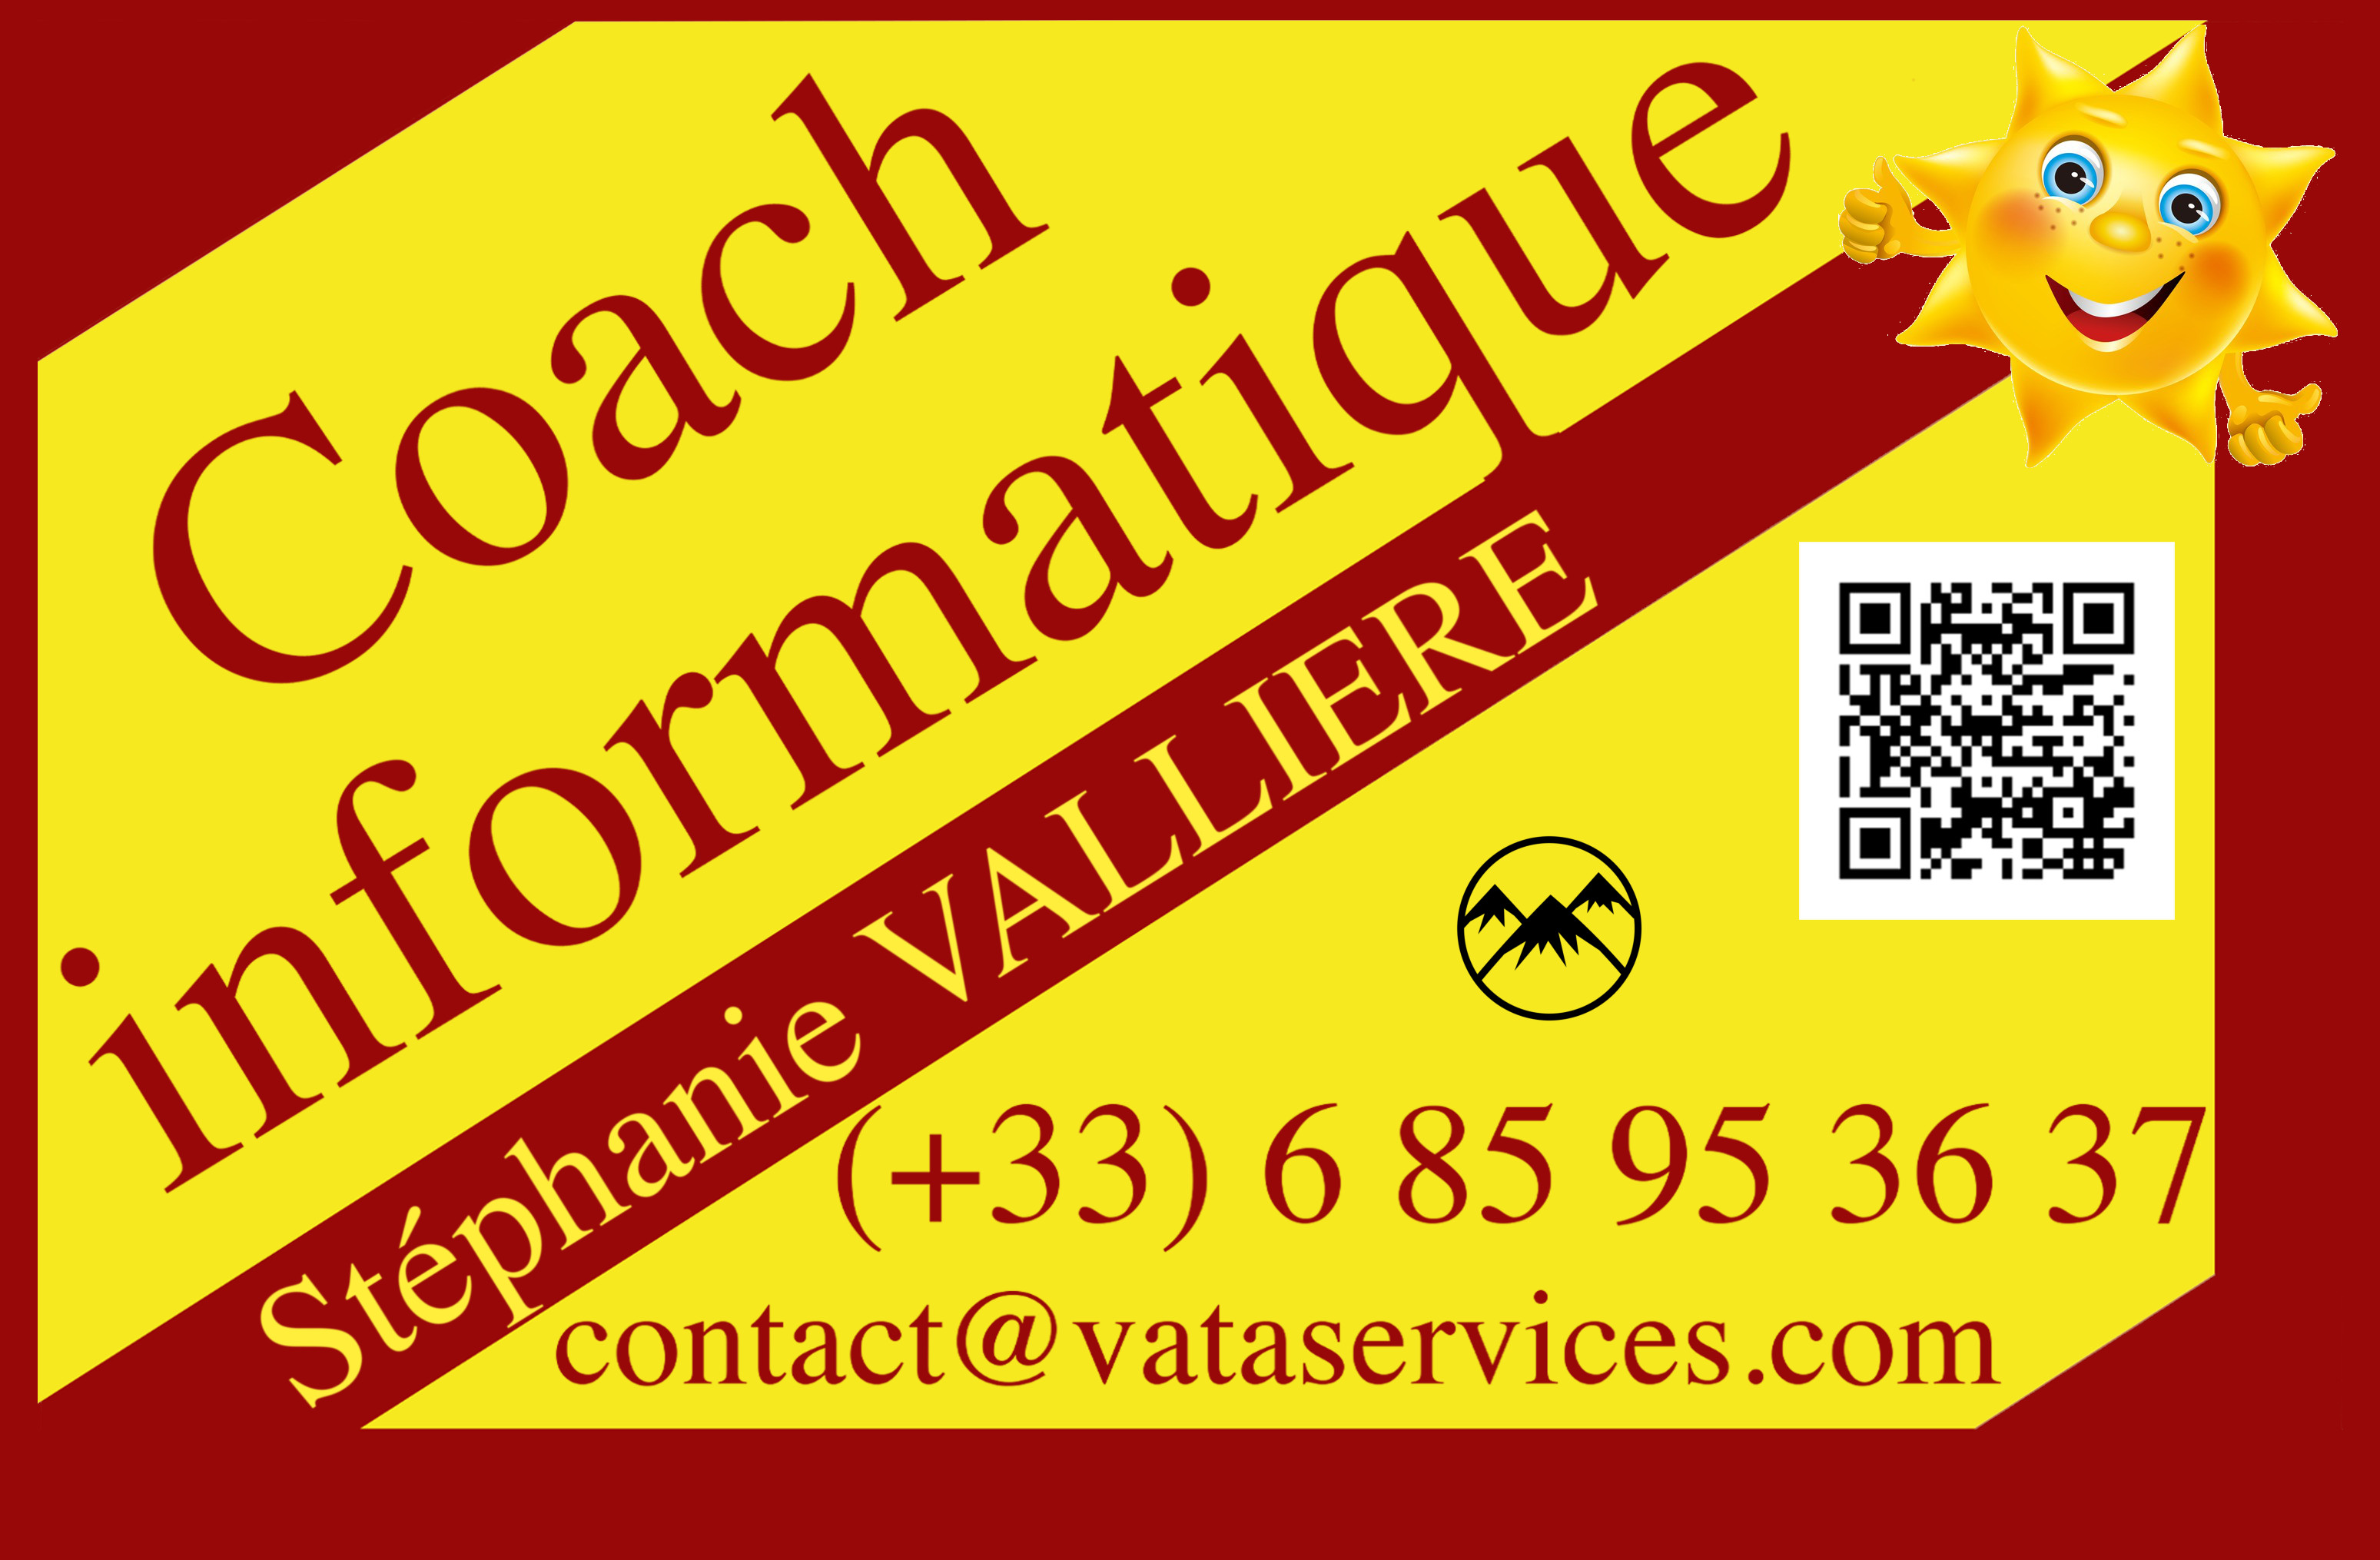 Cartes de visite Coach Informatique Vata